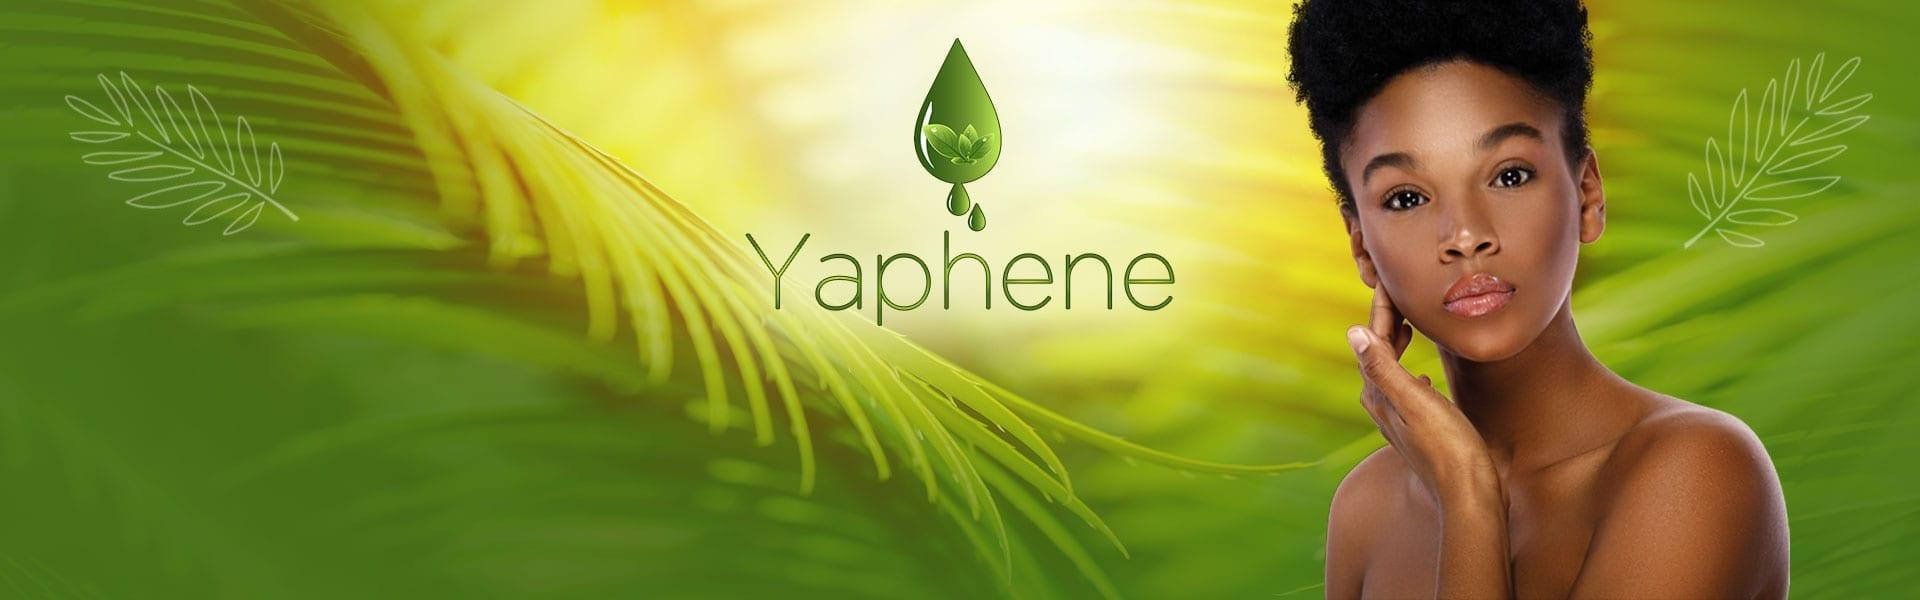 Yaphene